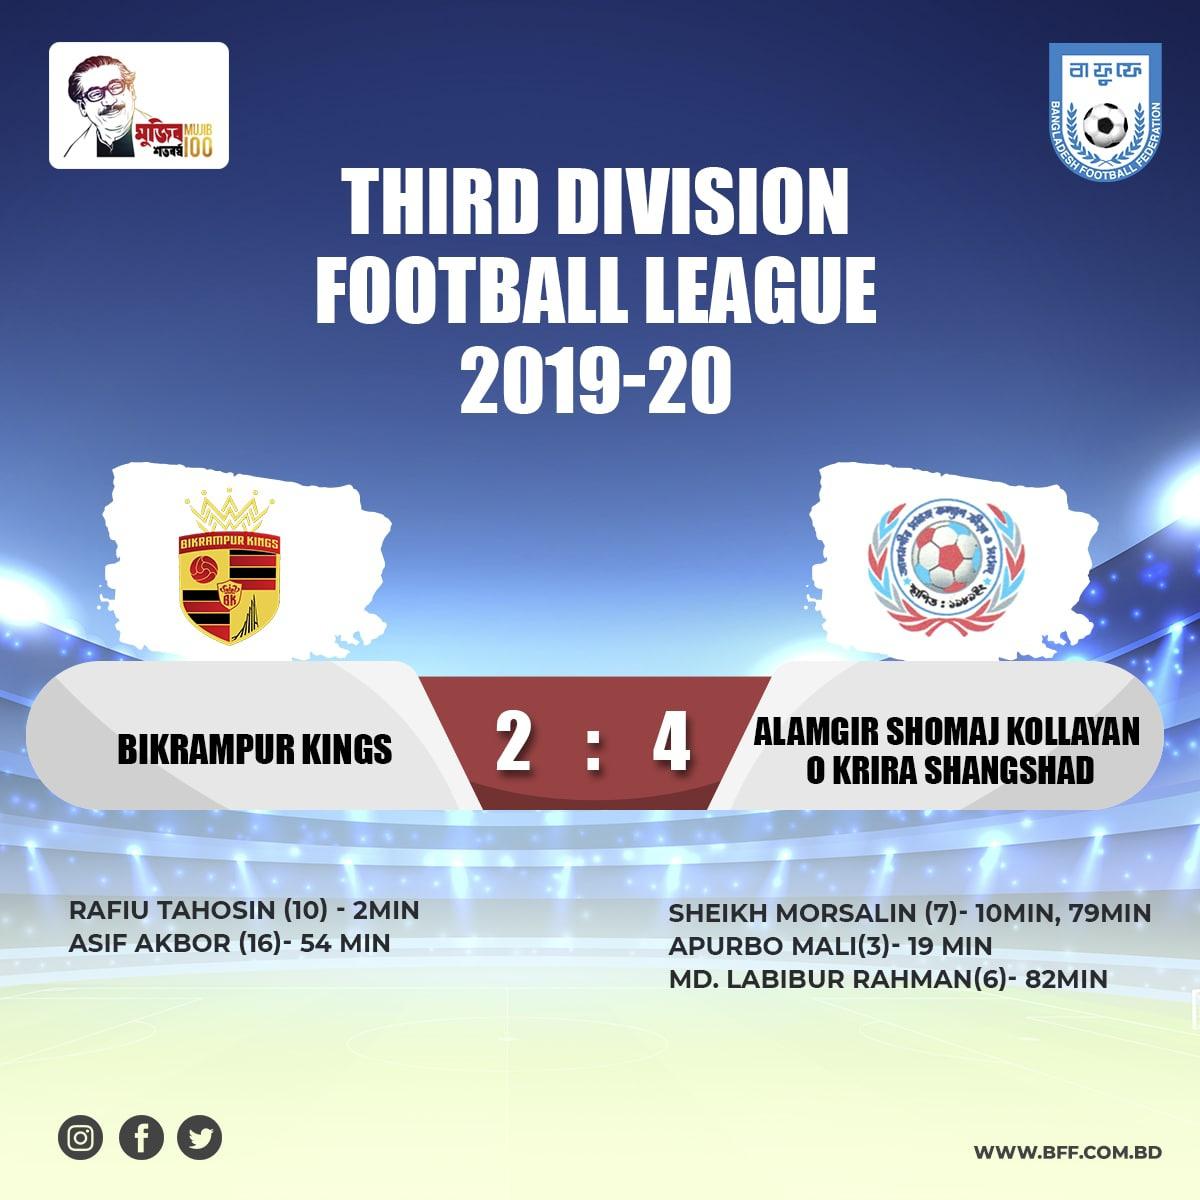 Alamgir Shomaj Kollayan O Krira Shangshad defeated Bikrampur Kings by 4-2 goals